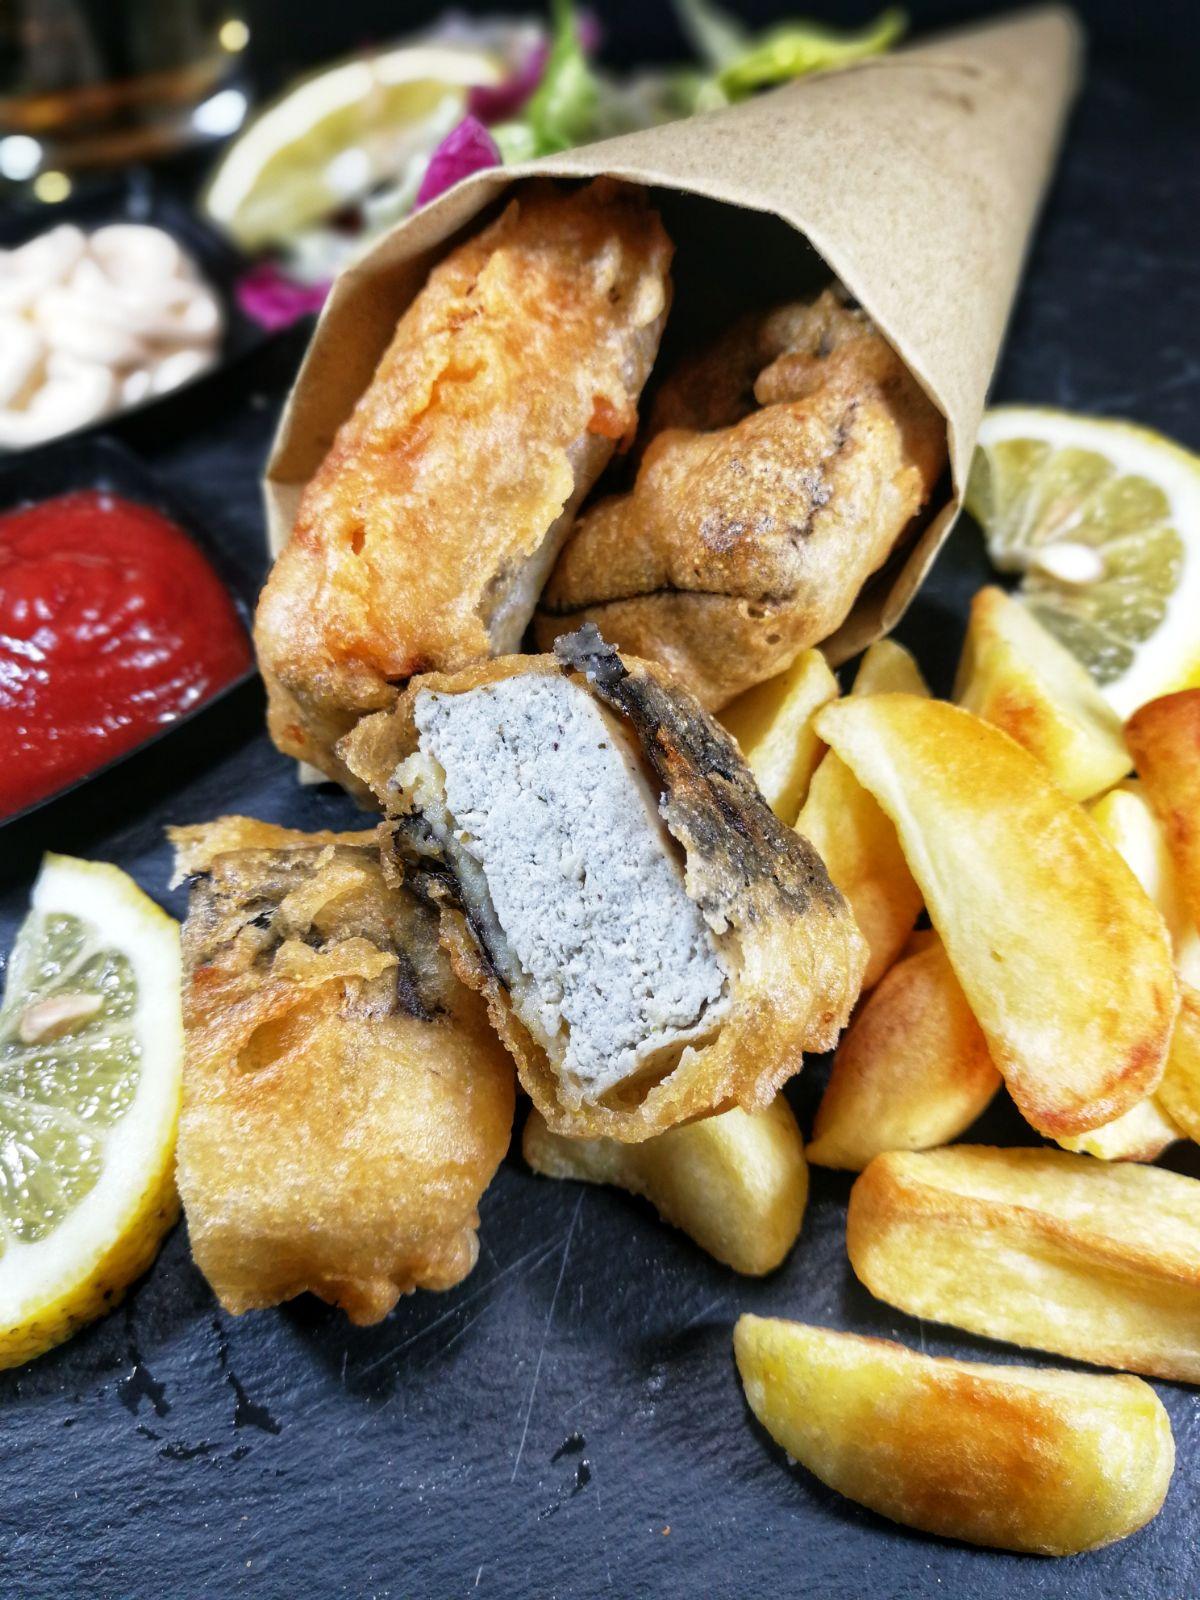 Patatine zero olio Veganblog ricette e prodotti dal